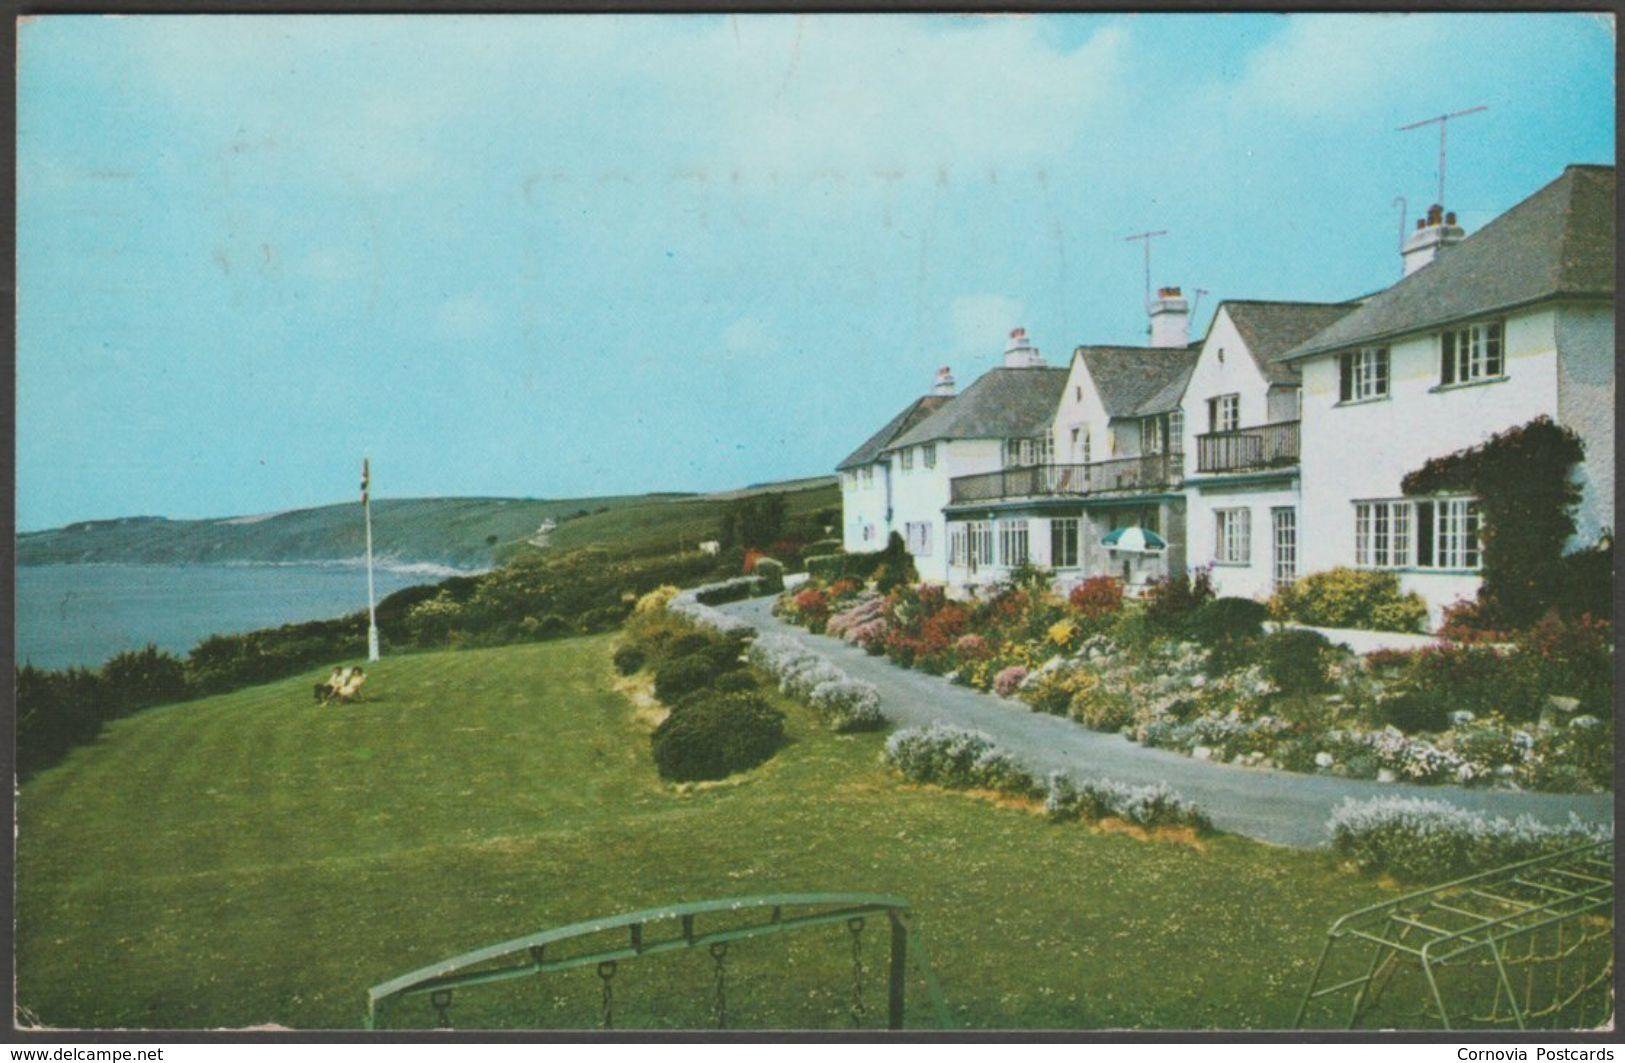 The Nare Hotel overlooking Gerrans Bay, Cornwall, 1969 - Toyne Postcard